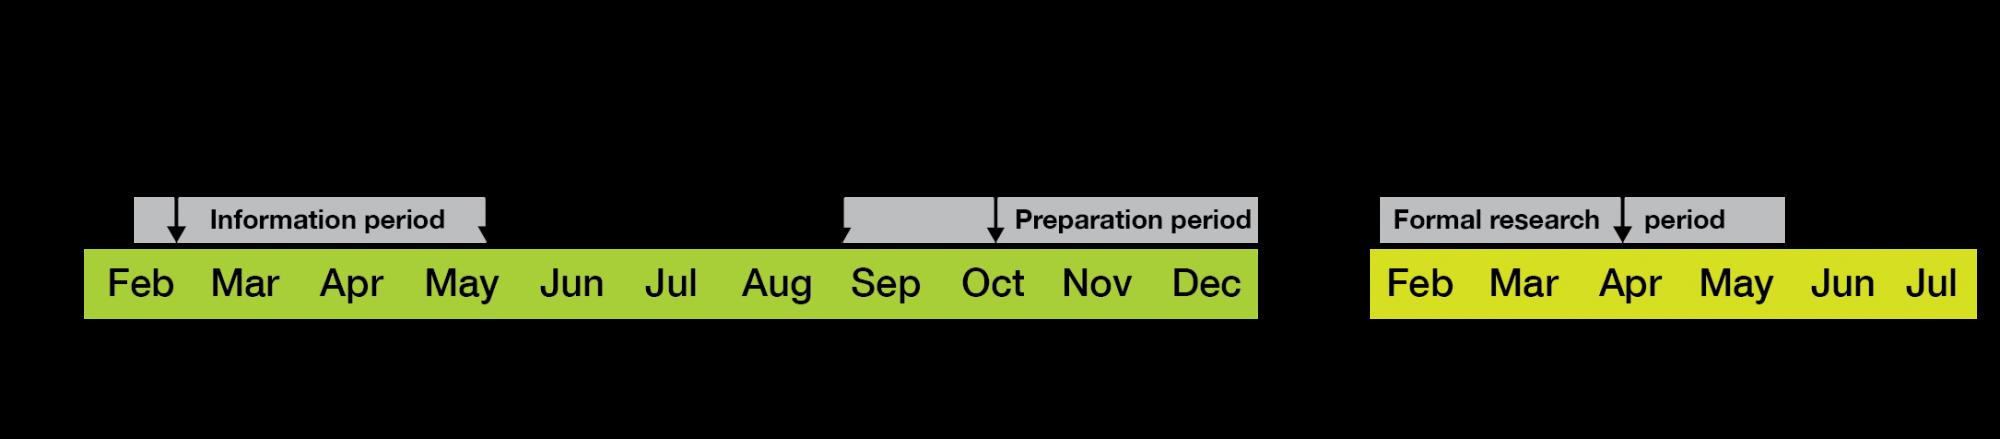 MDRPdiagram